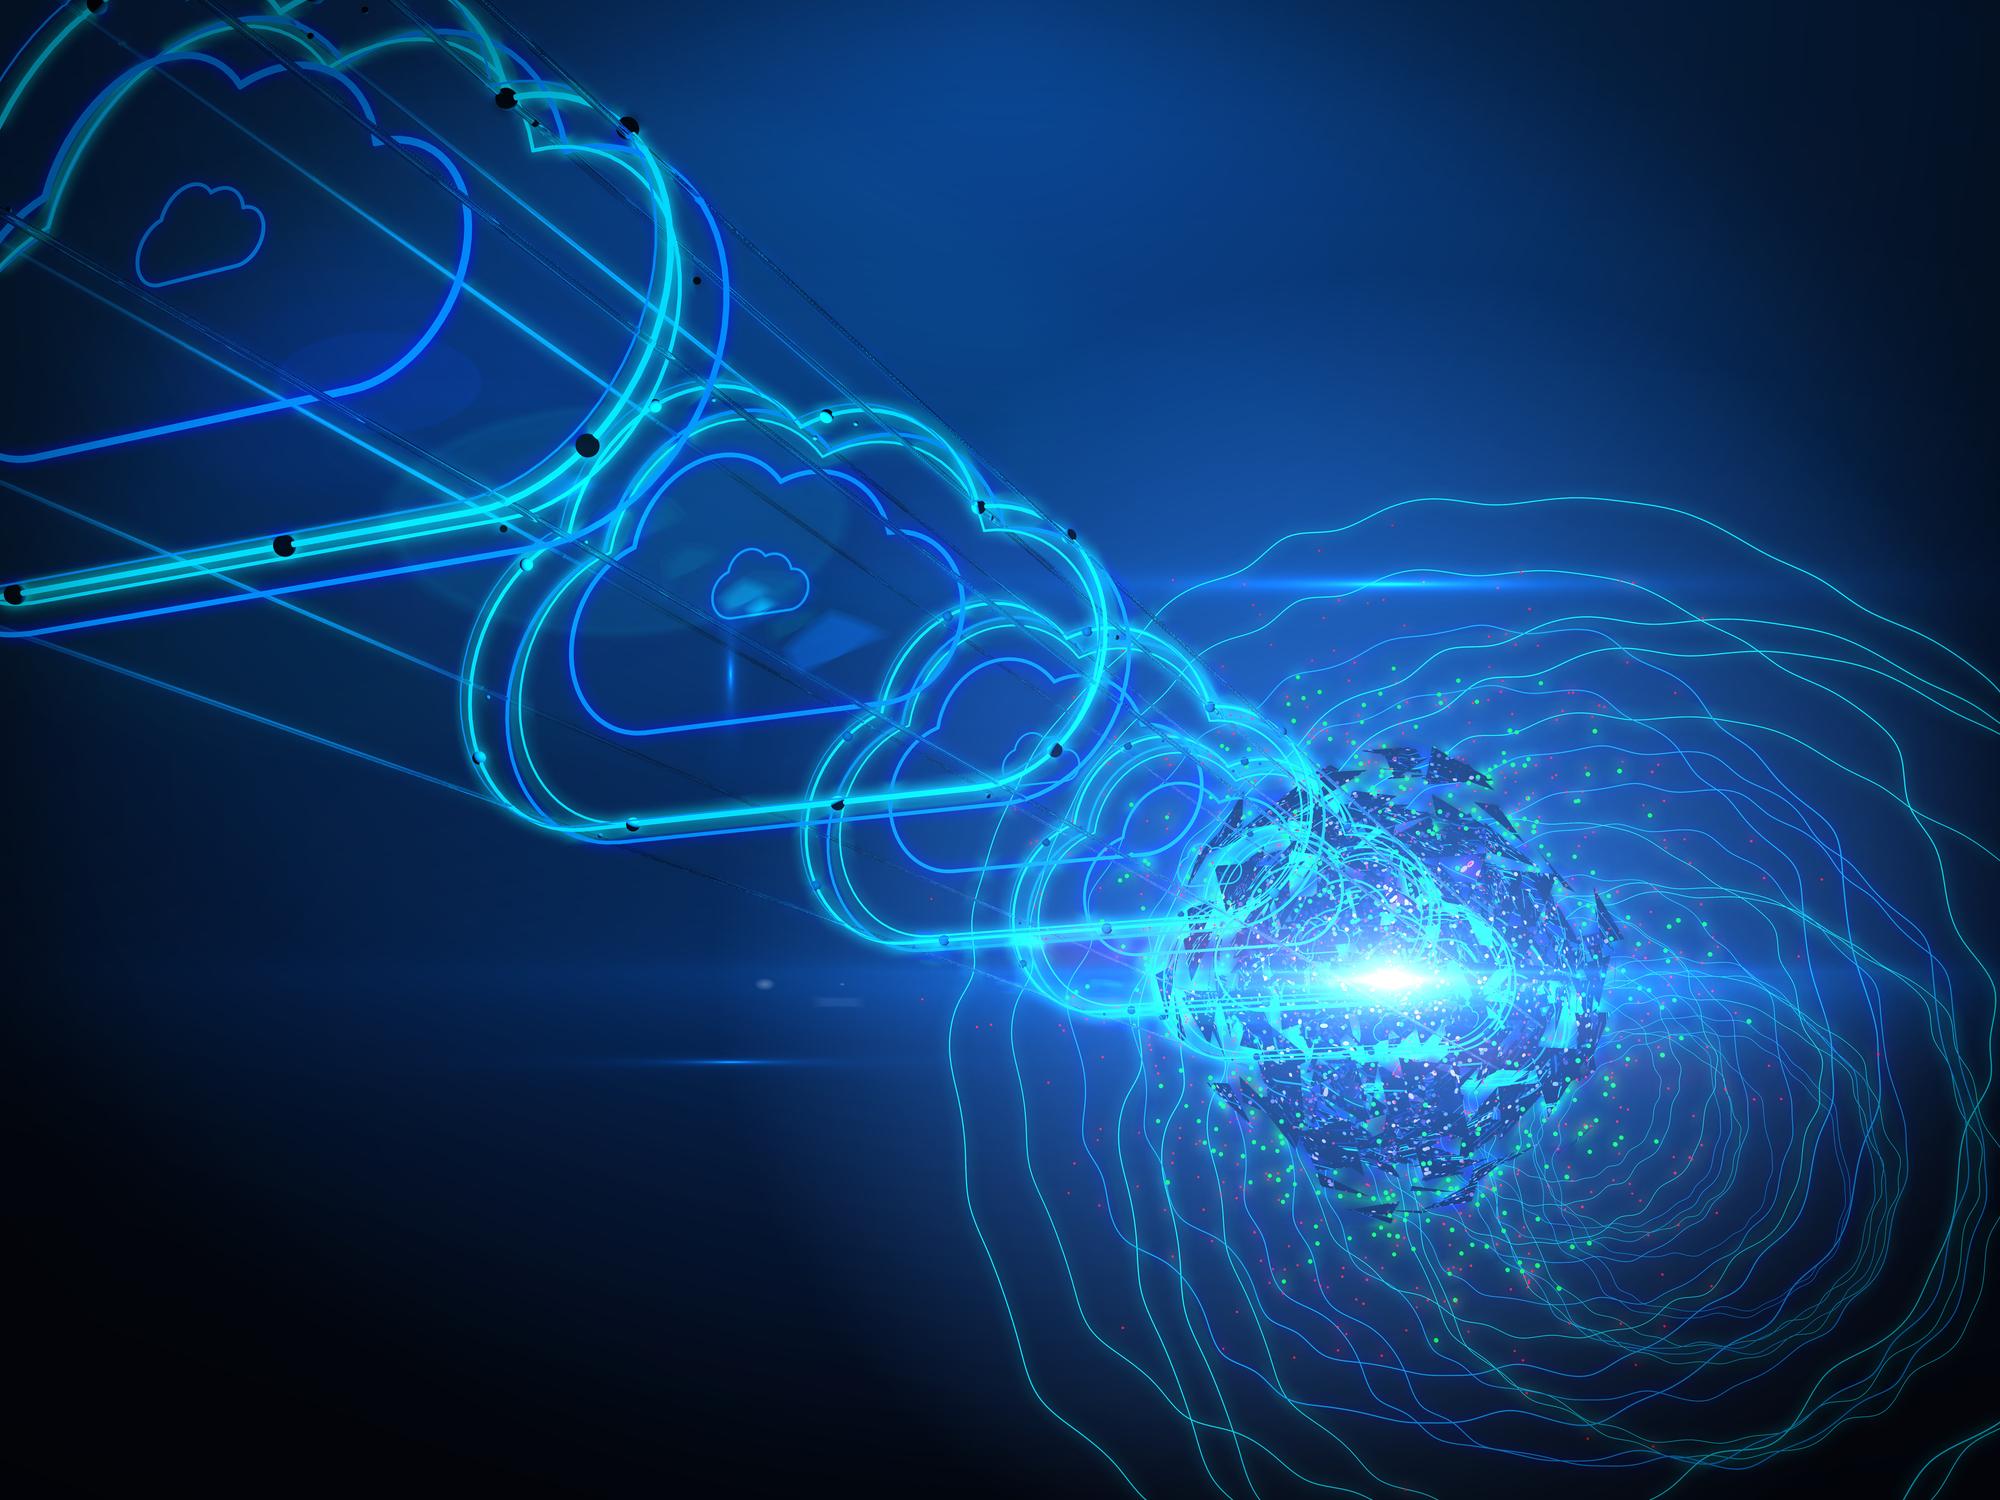 IBM Release IBM Cloud Private, a Hybrid Cloud Computing